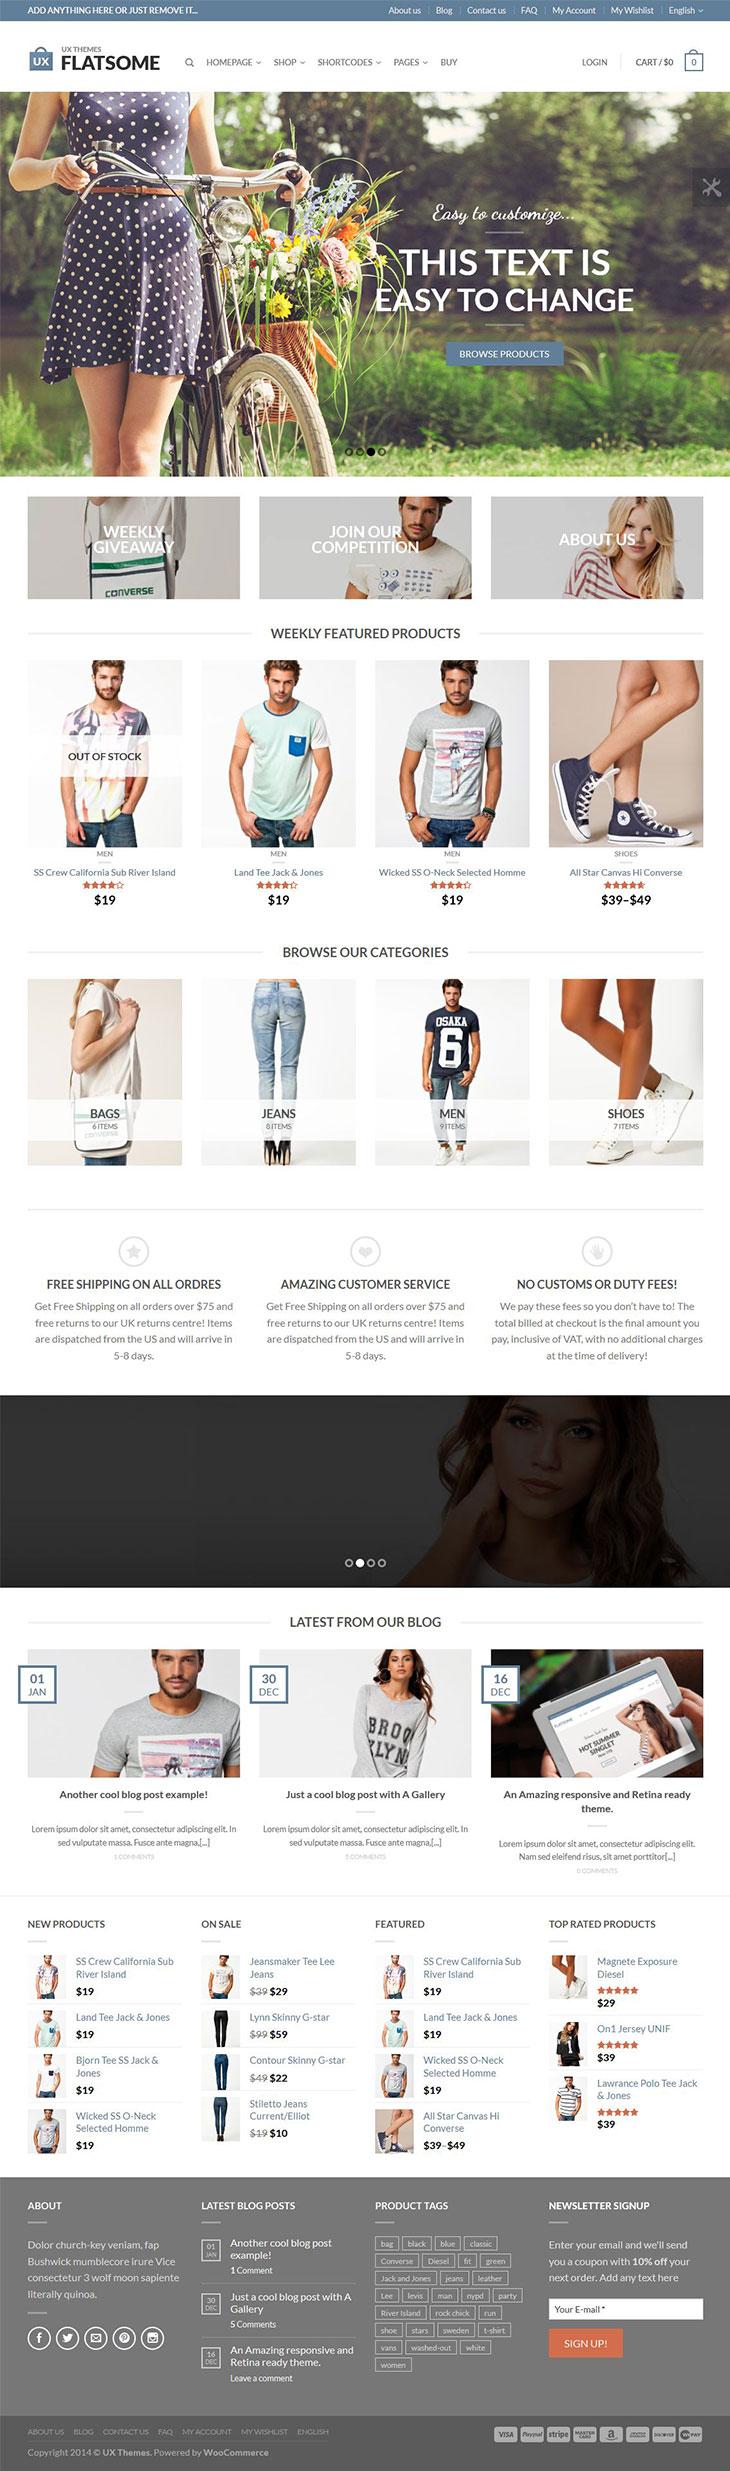 flat-responsive-woocommerce-theme-homepage